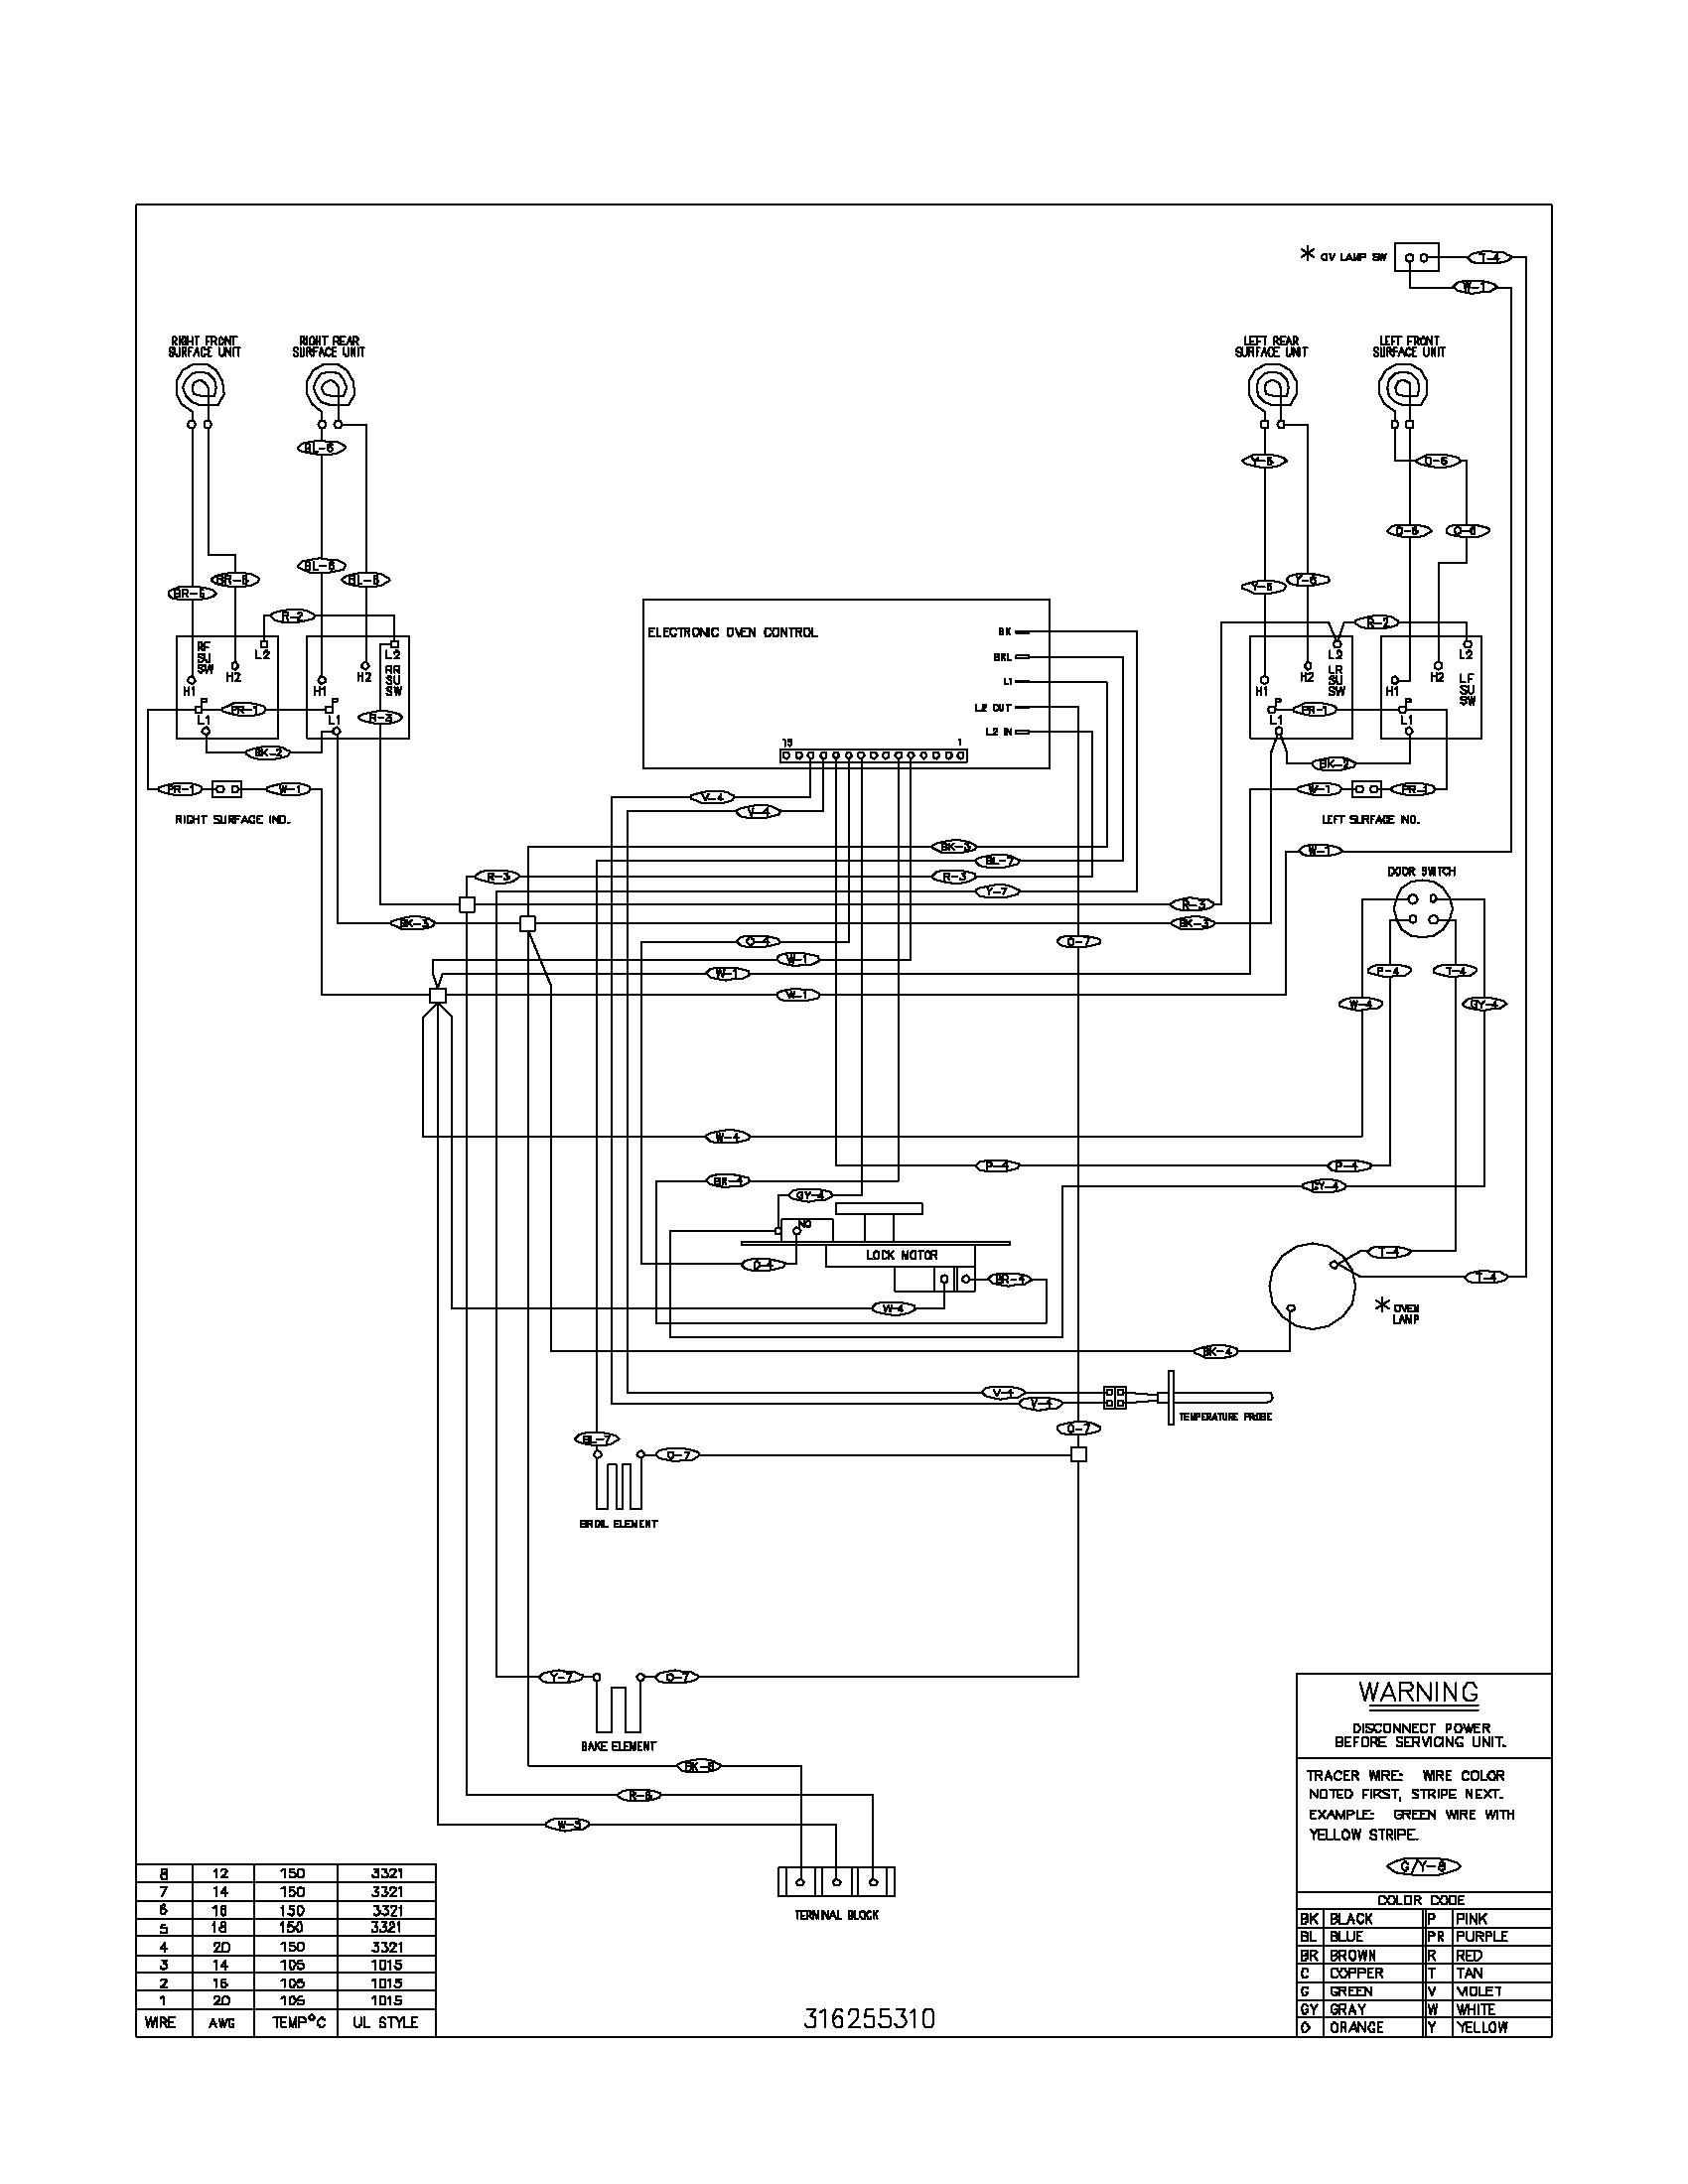 Diagram Stove Wiring Ge Js9685 K6ss Completed Diagrams Jenn Air Top